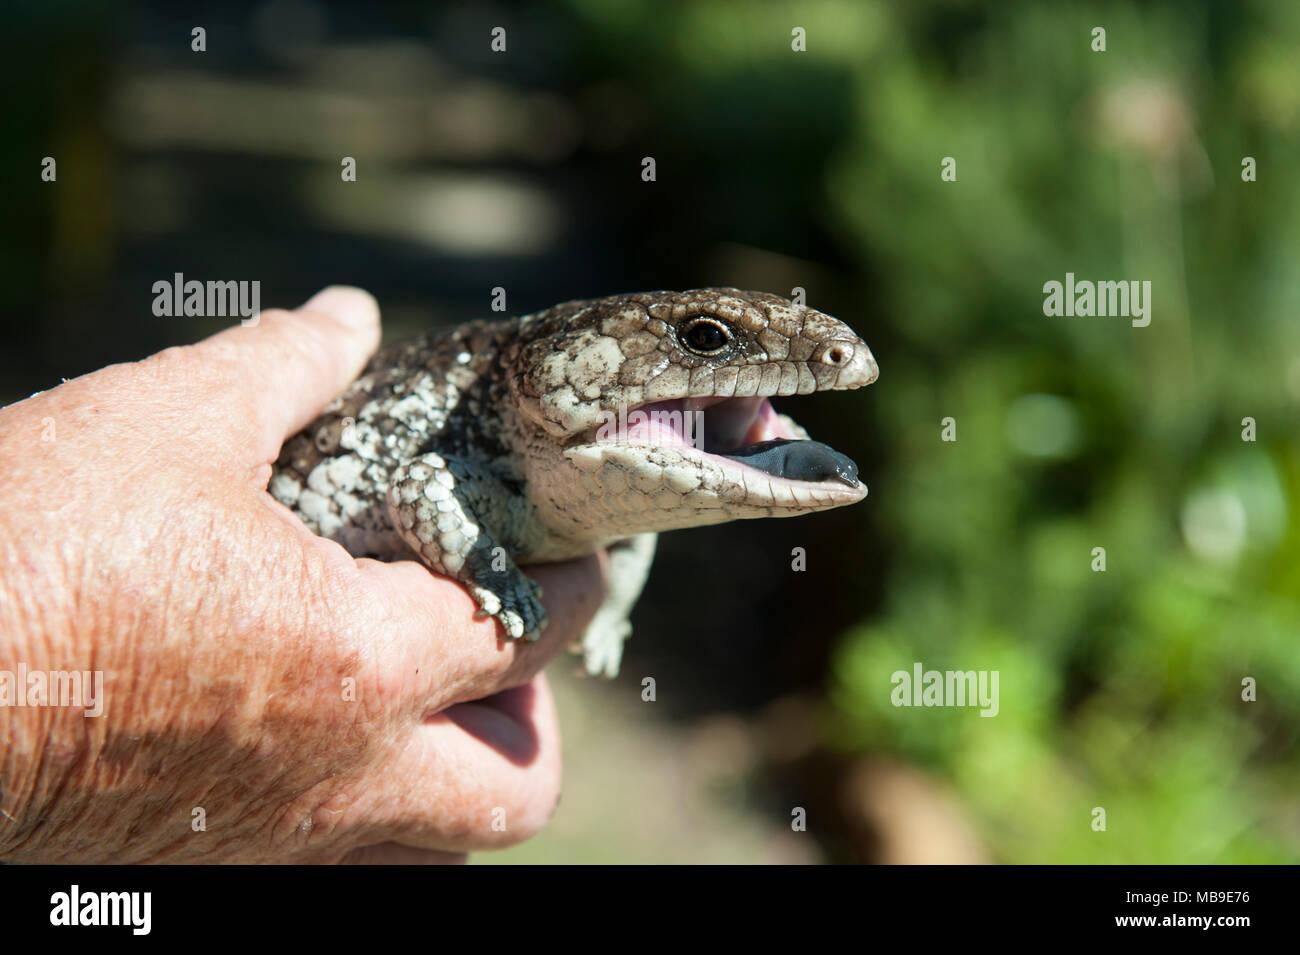 A healthy adult Bobtail lizard (Tiliqua rugosa), found in a suburban Western Australian garden Stock Photo